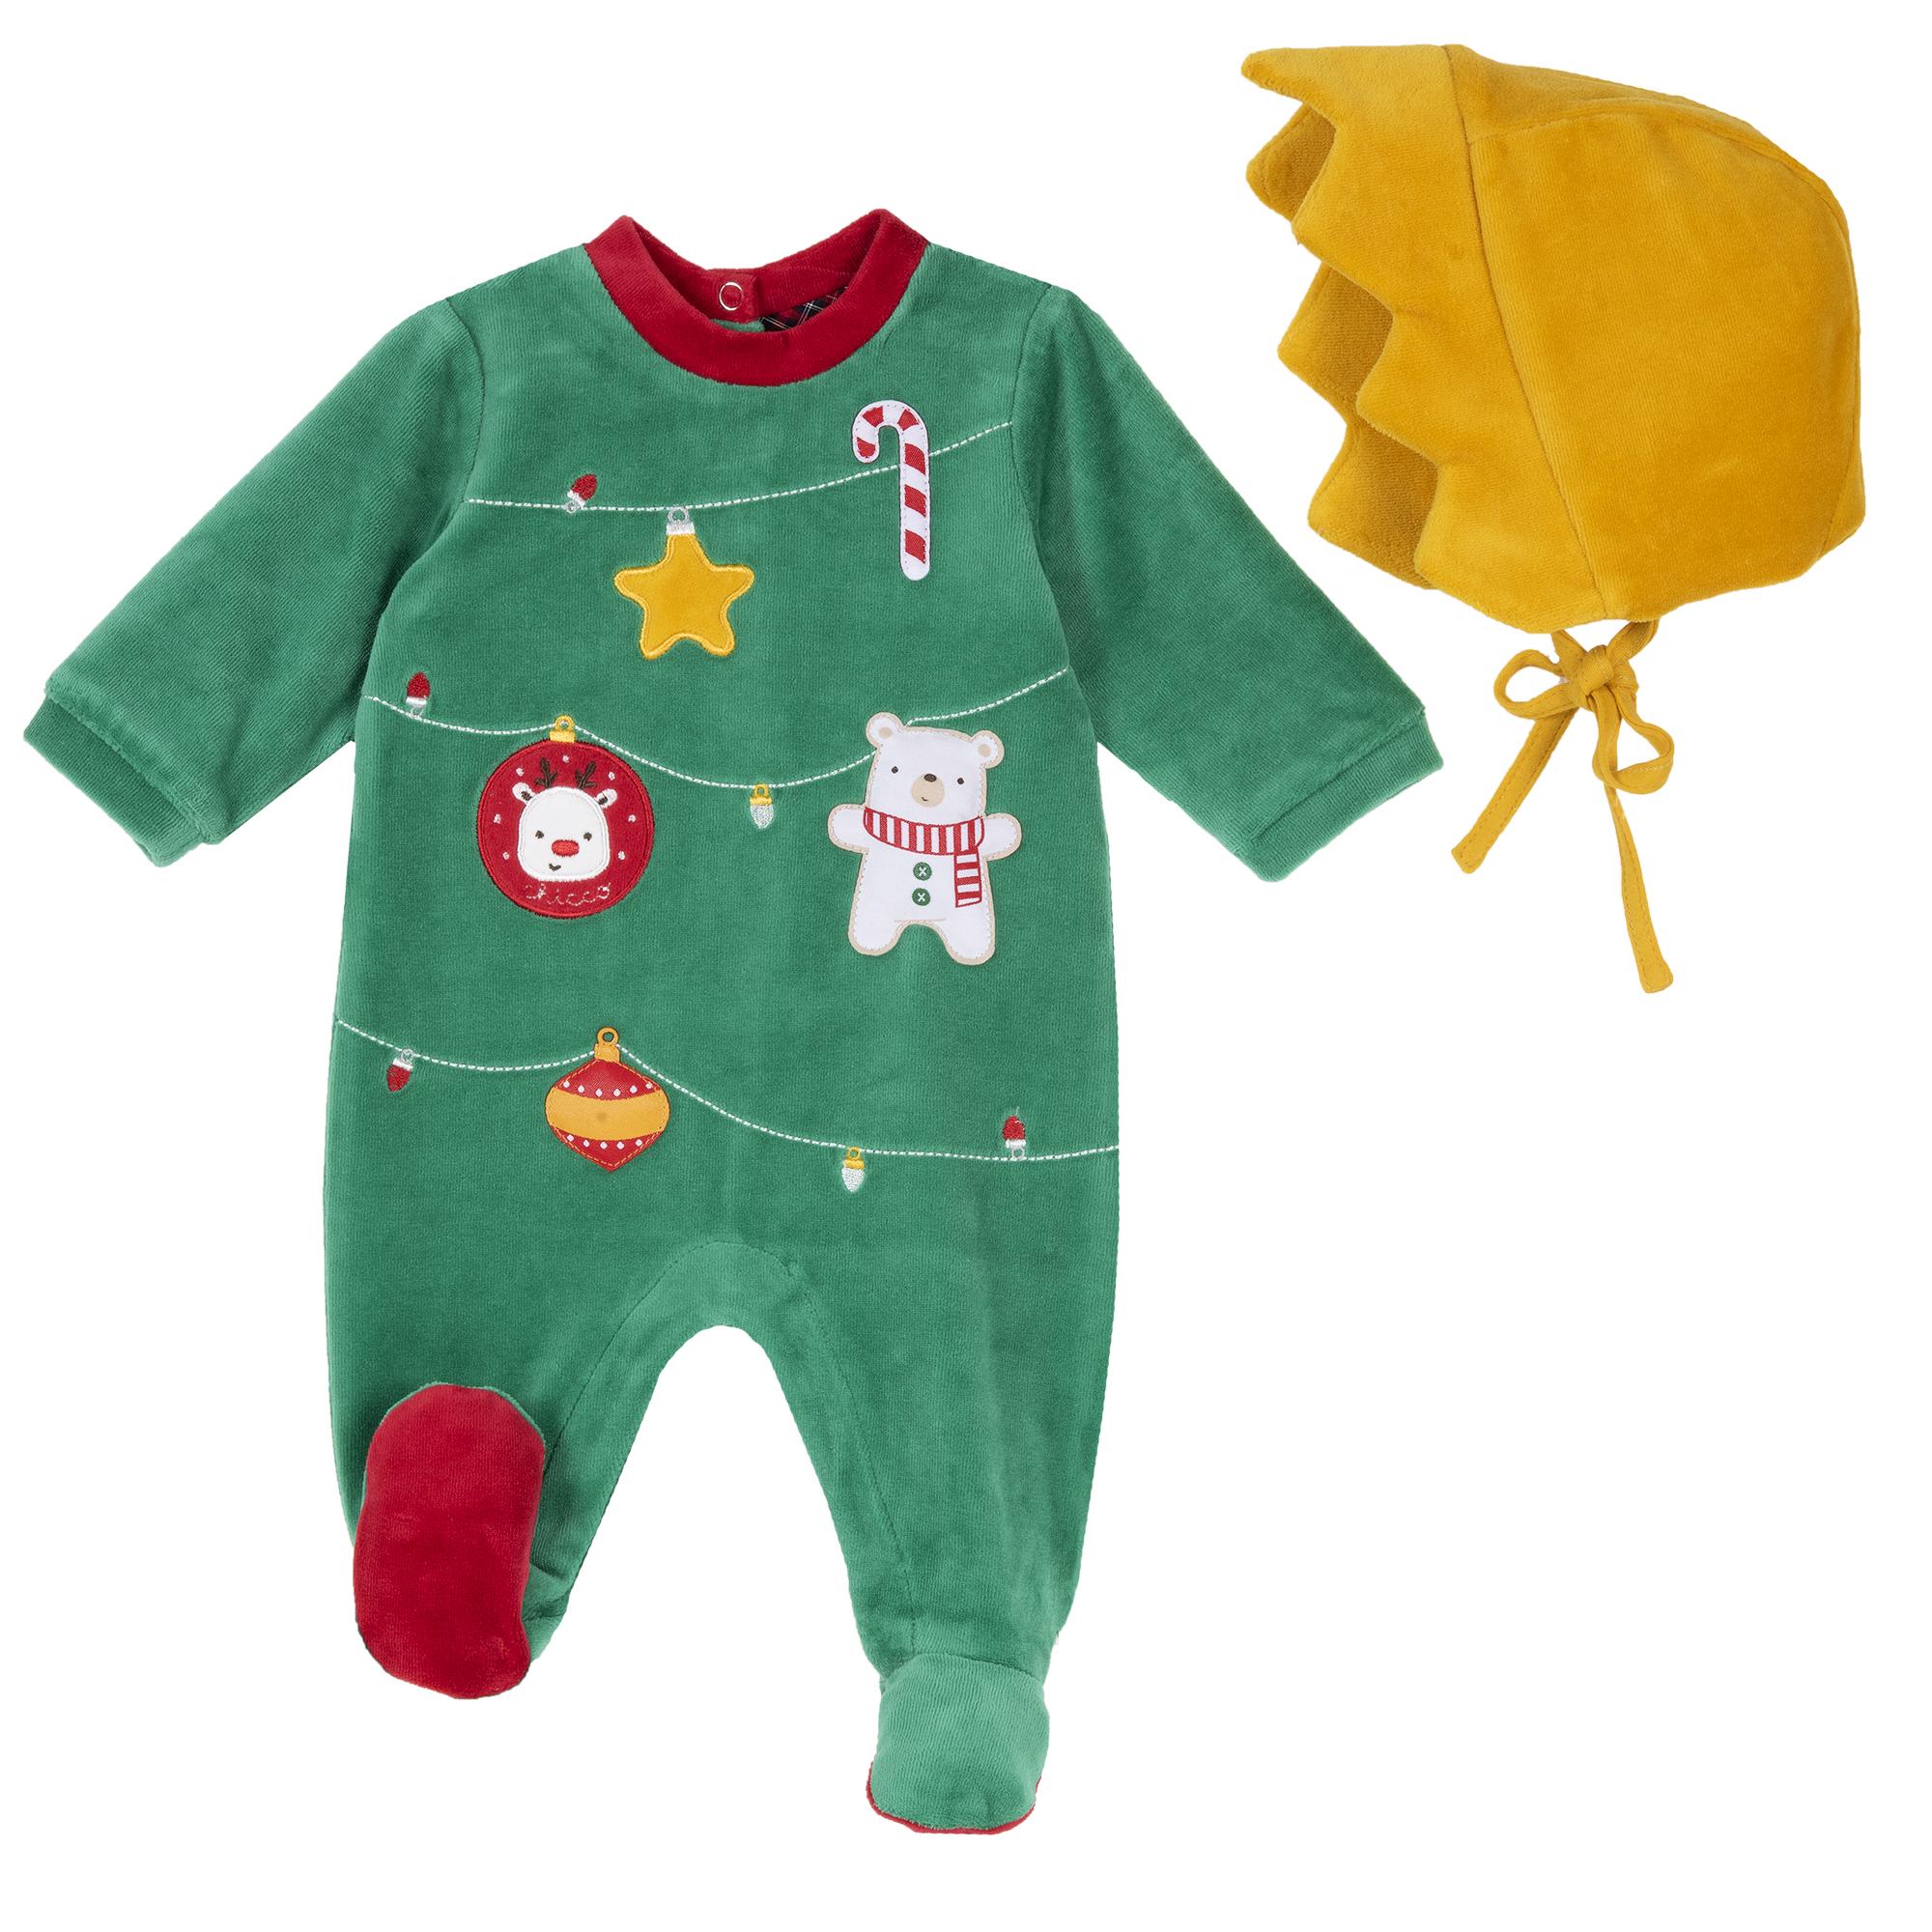 Set Costum Craciun Pentru Copii, Verde, 20798 imagine